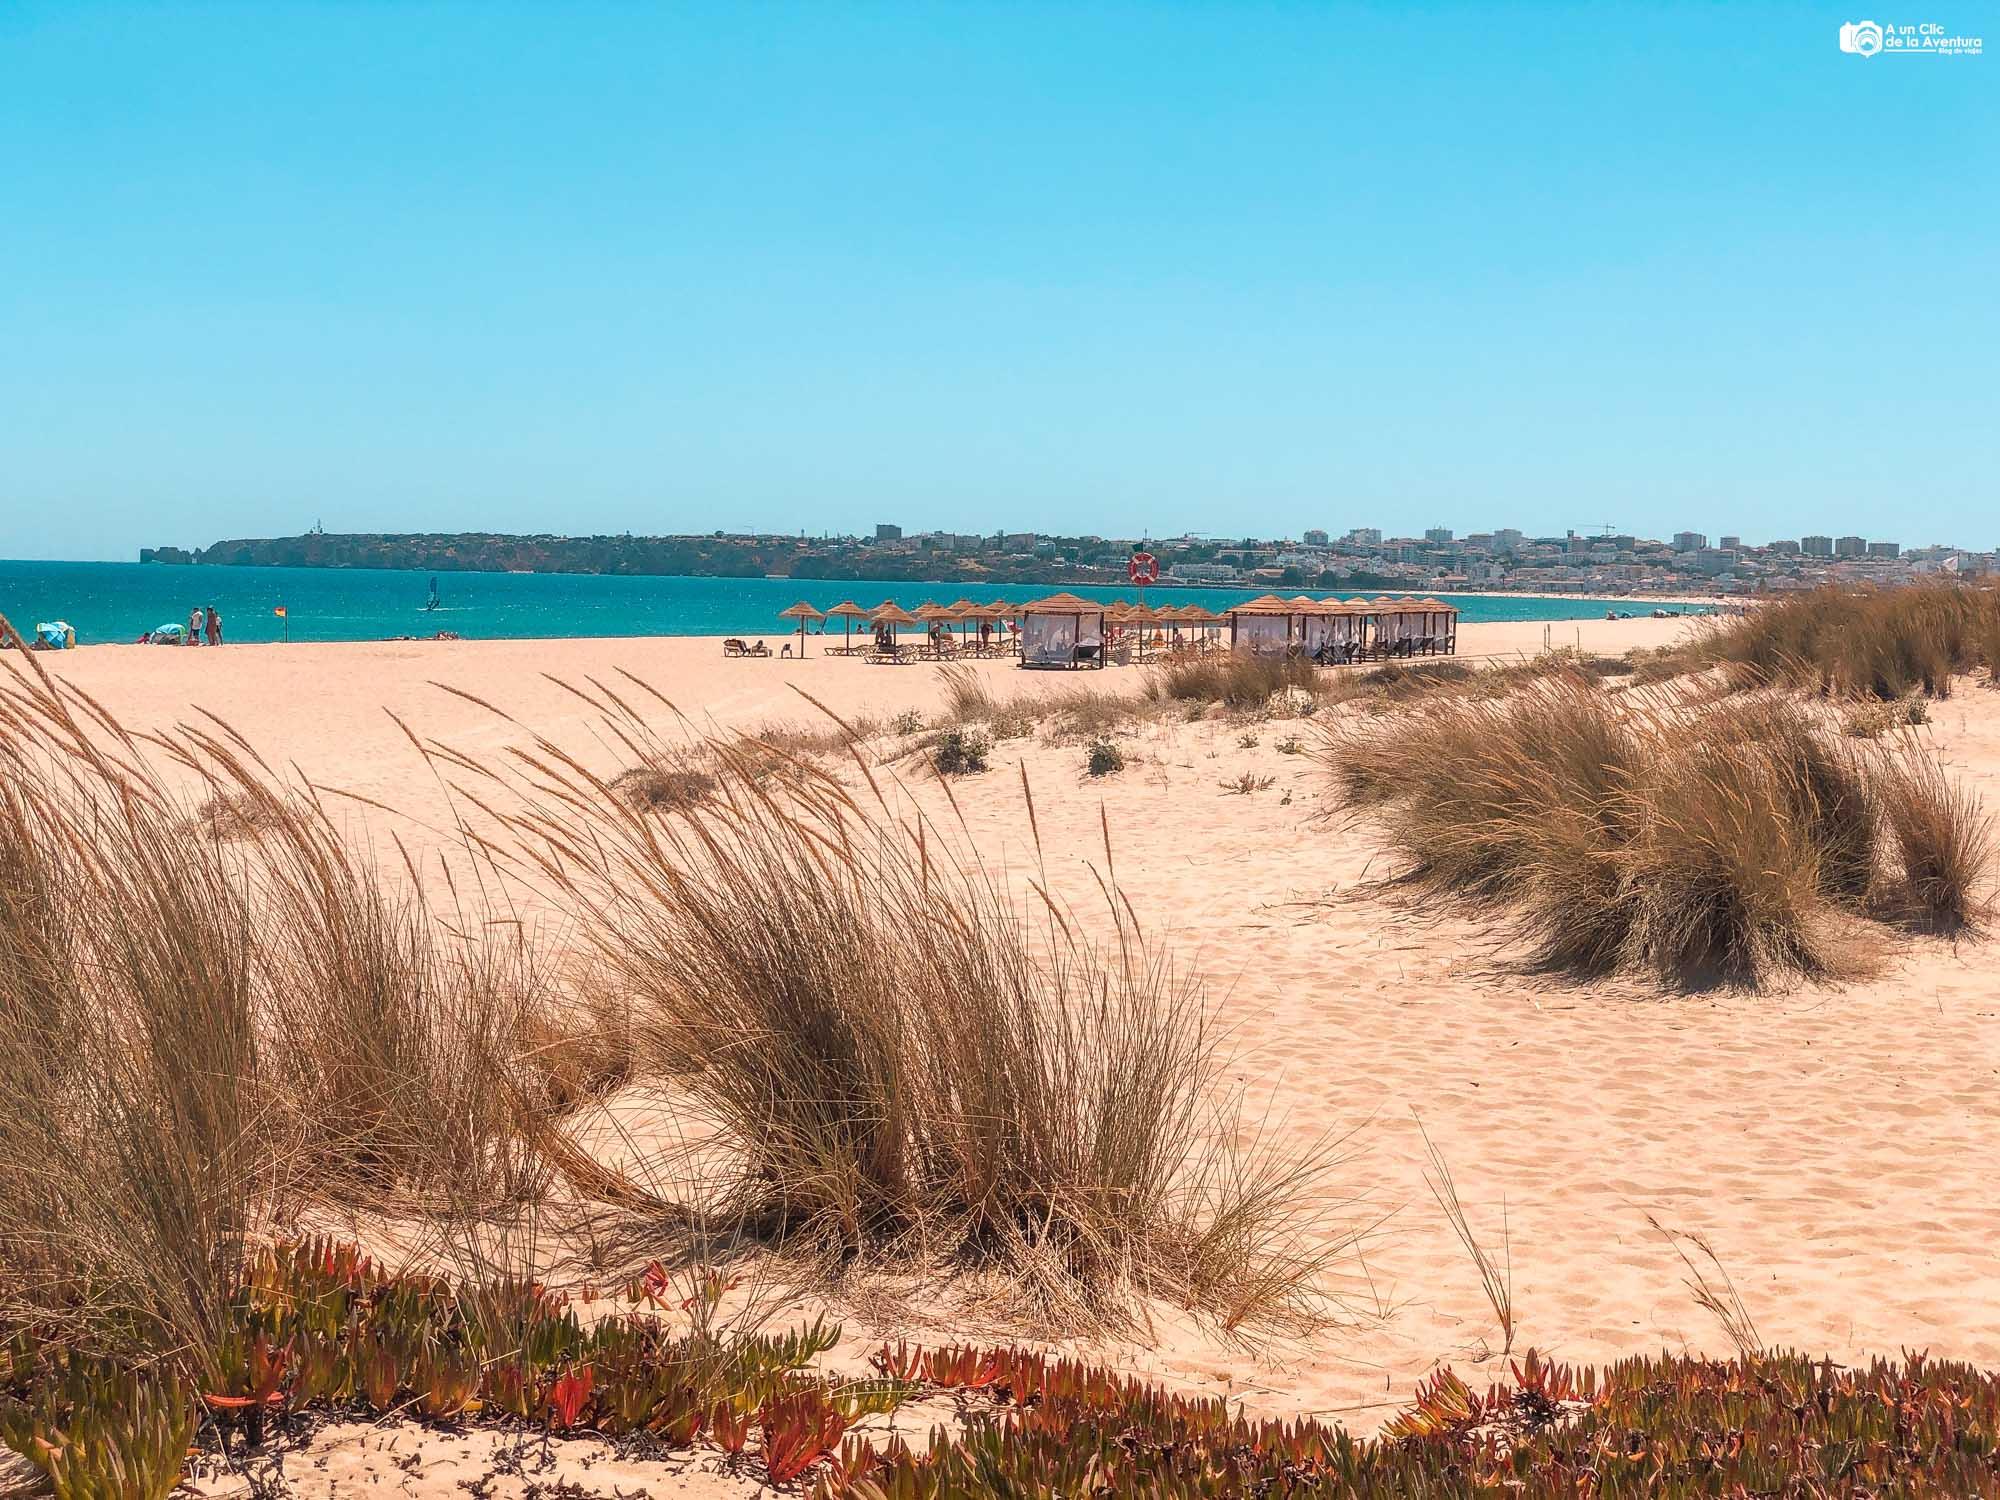 Meia Praia o Media Playa